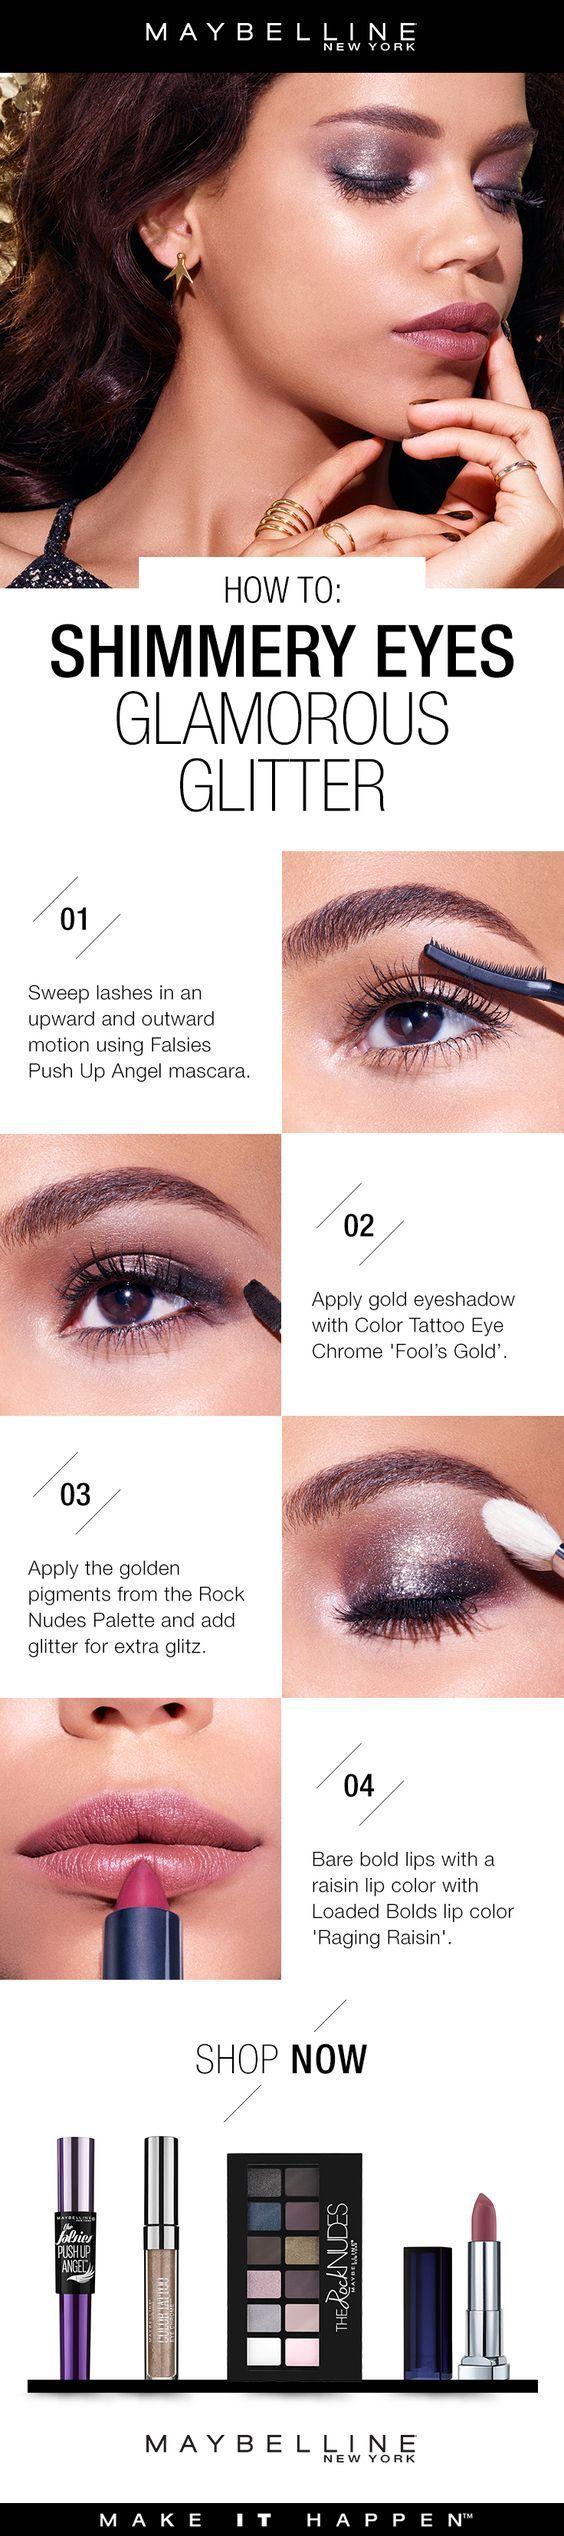 Find This Pin And More On B E A U T Y Makeup Trends, Tips